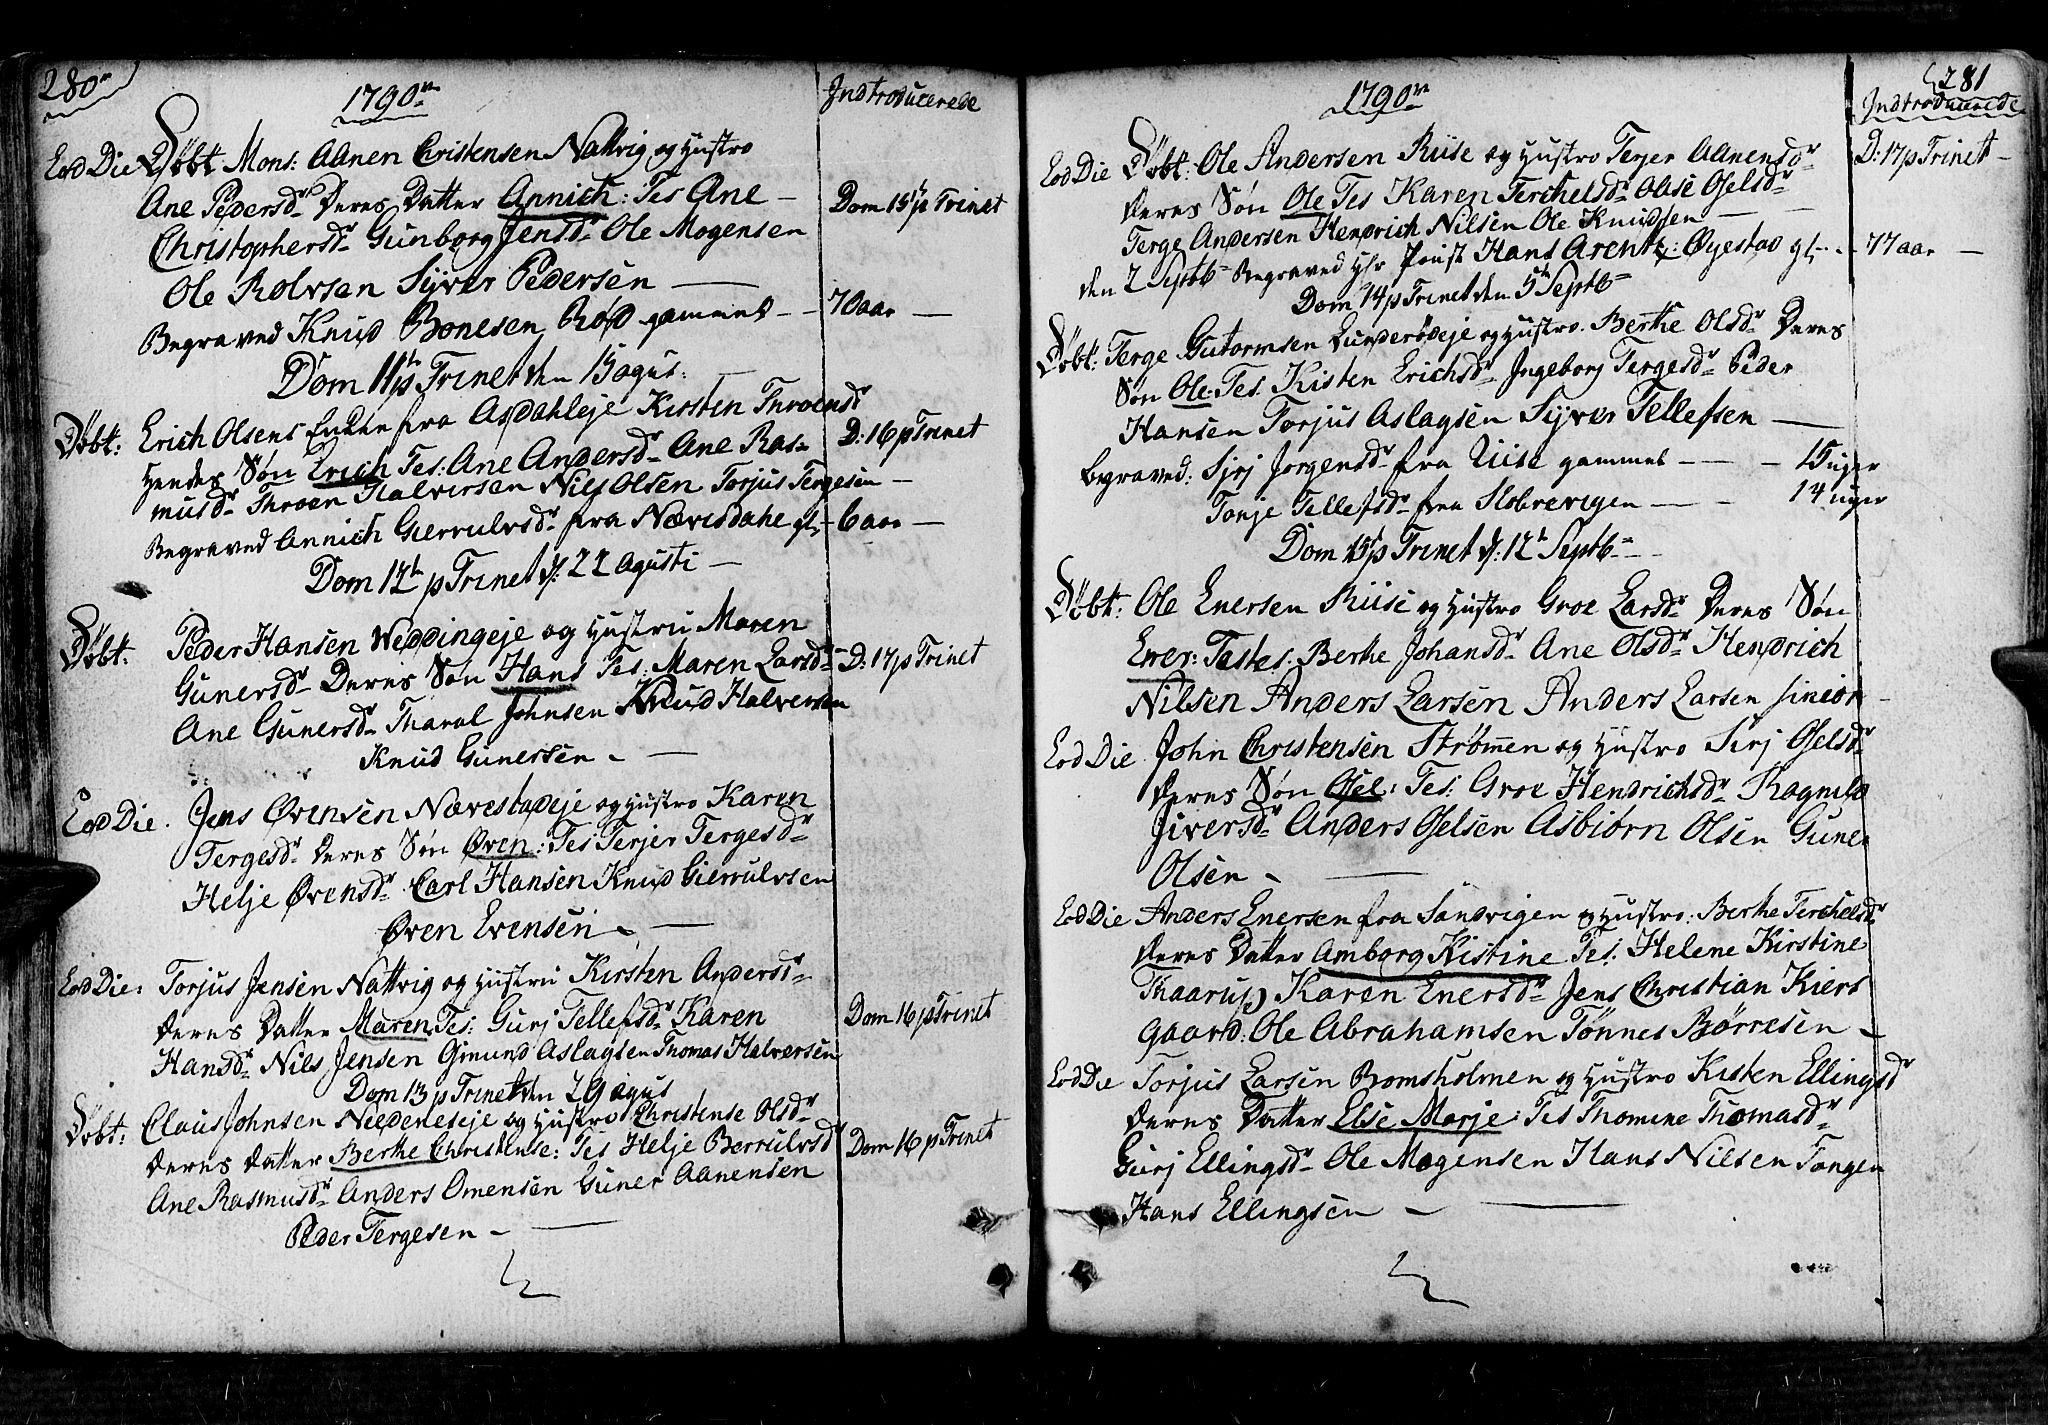 SAK, Øyestad sokneprestkontor, F/Fa/L0008: Ministerialbok nr. A 8, 1777-1804, s. 280-281